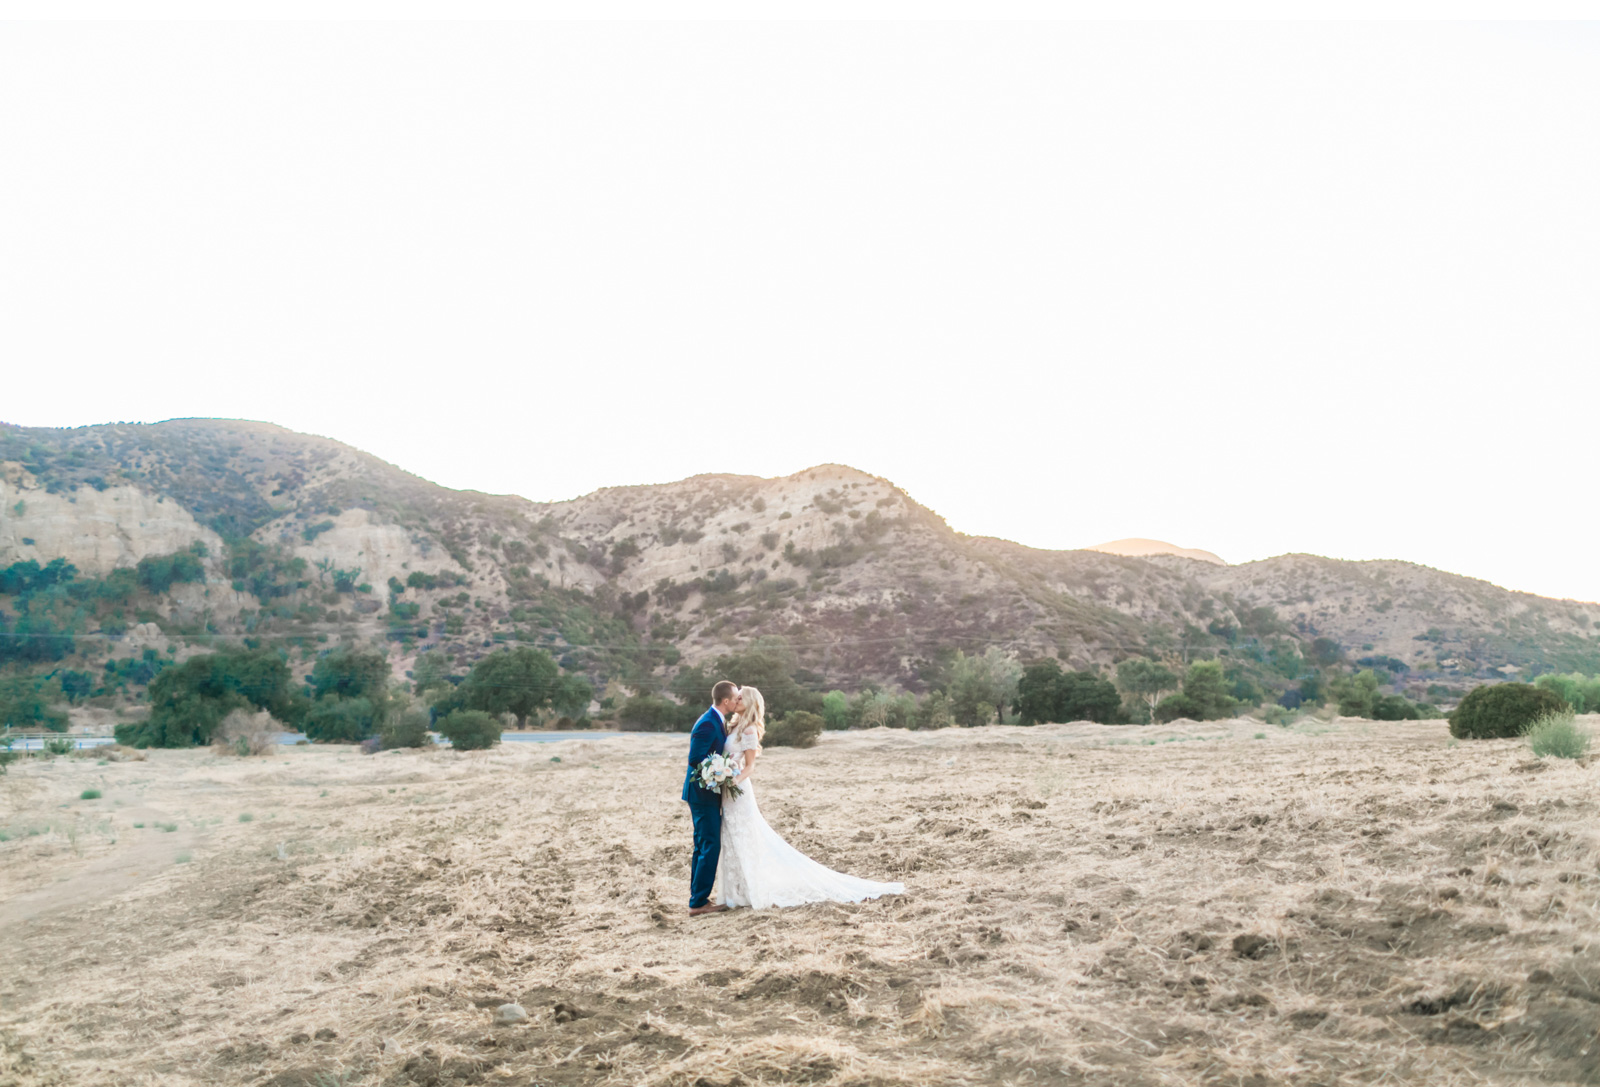 California-Wedding-Photographer-Style-Me-Pretty-Natalie-Schutt-San-Luis-Obispo_09.jpg